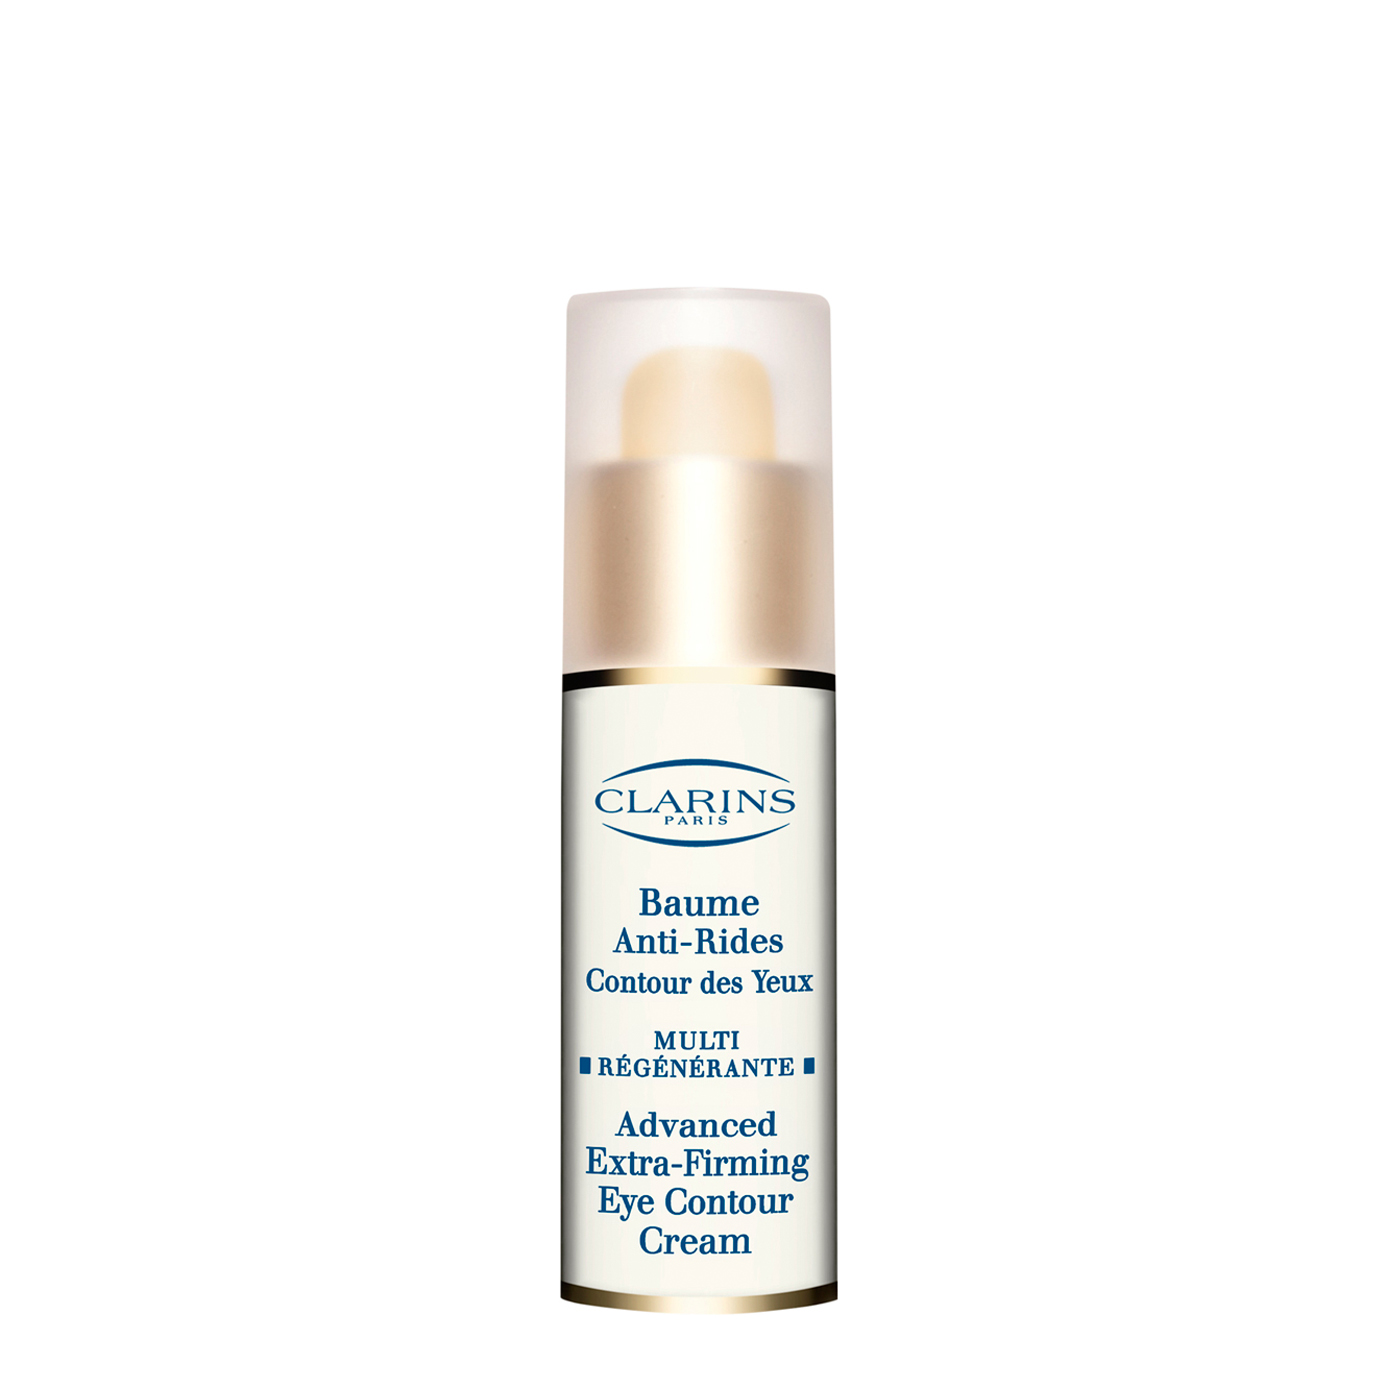 clarins eye contour cream